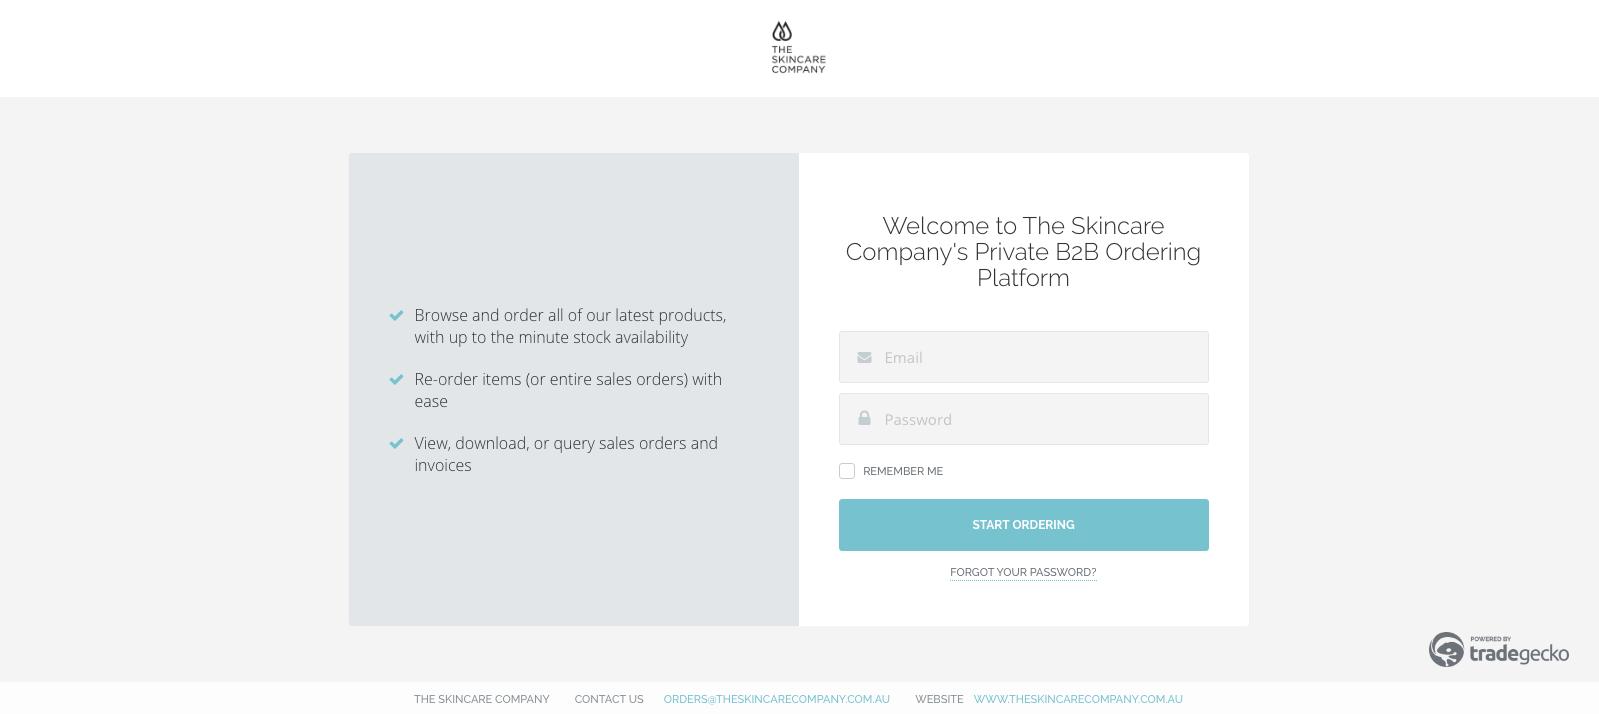 The Skincare Company B2B eCommerce Platform